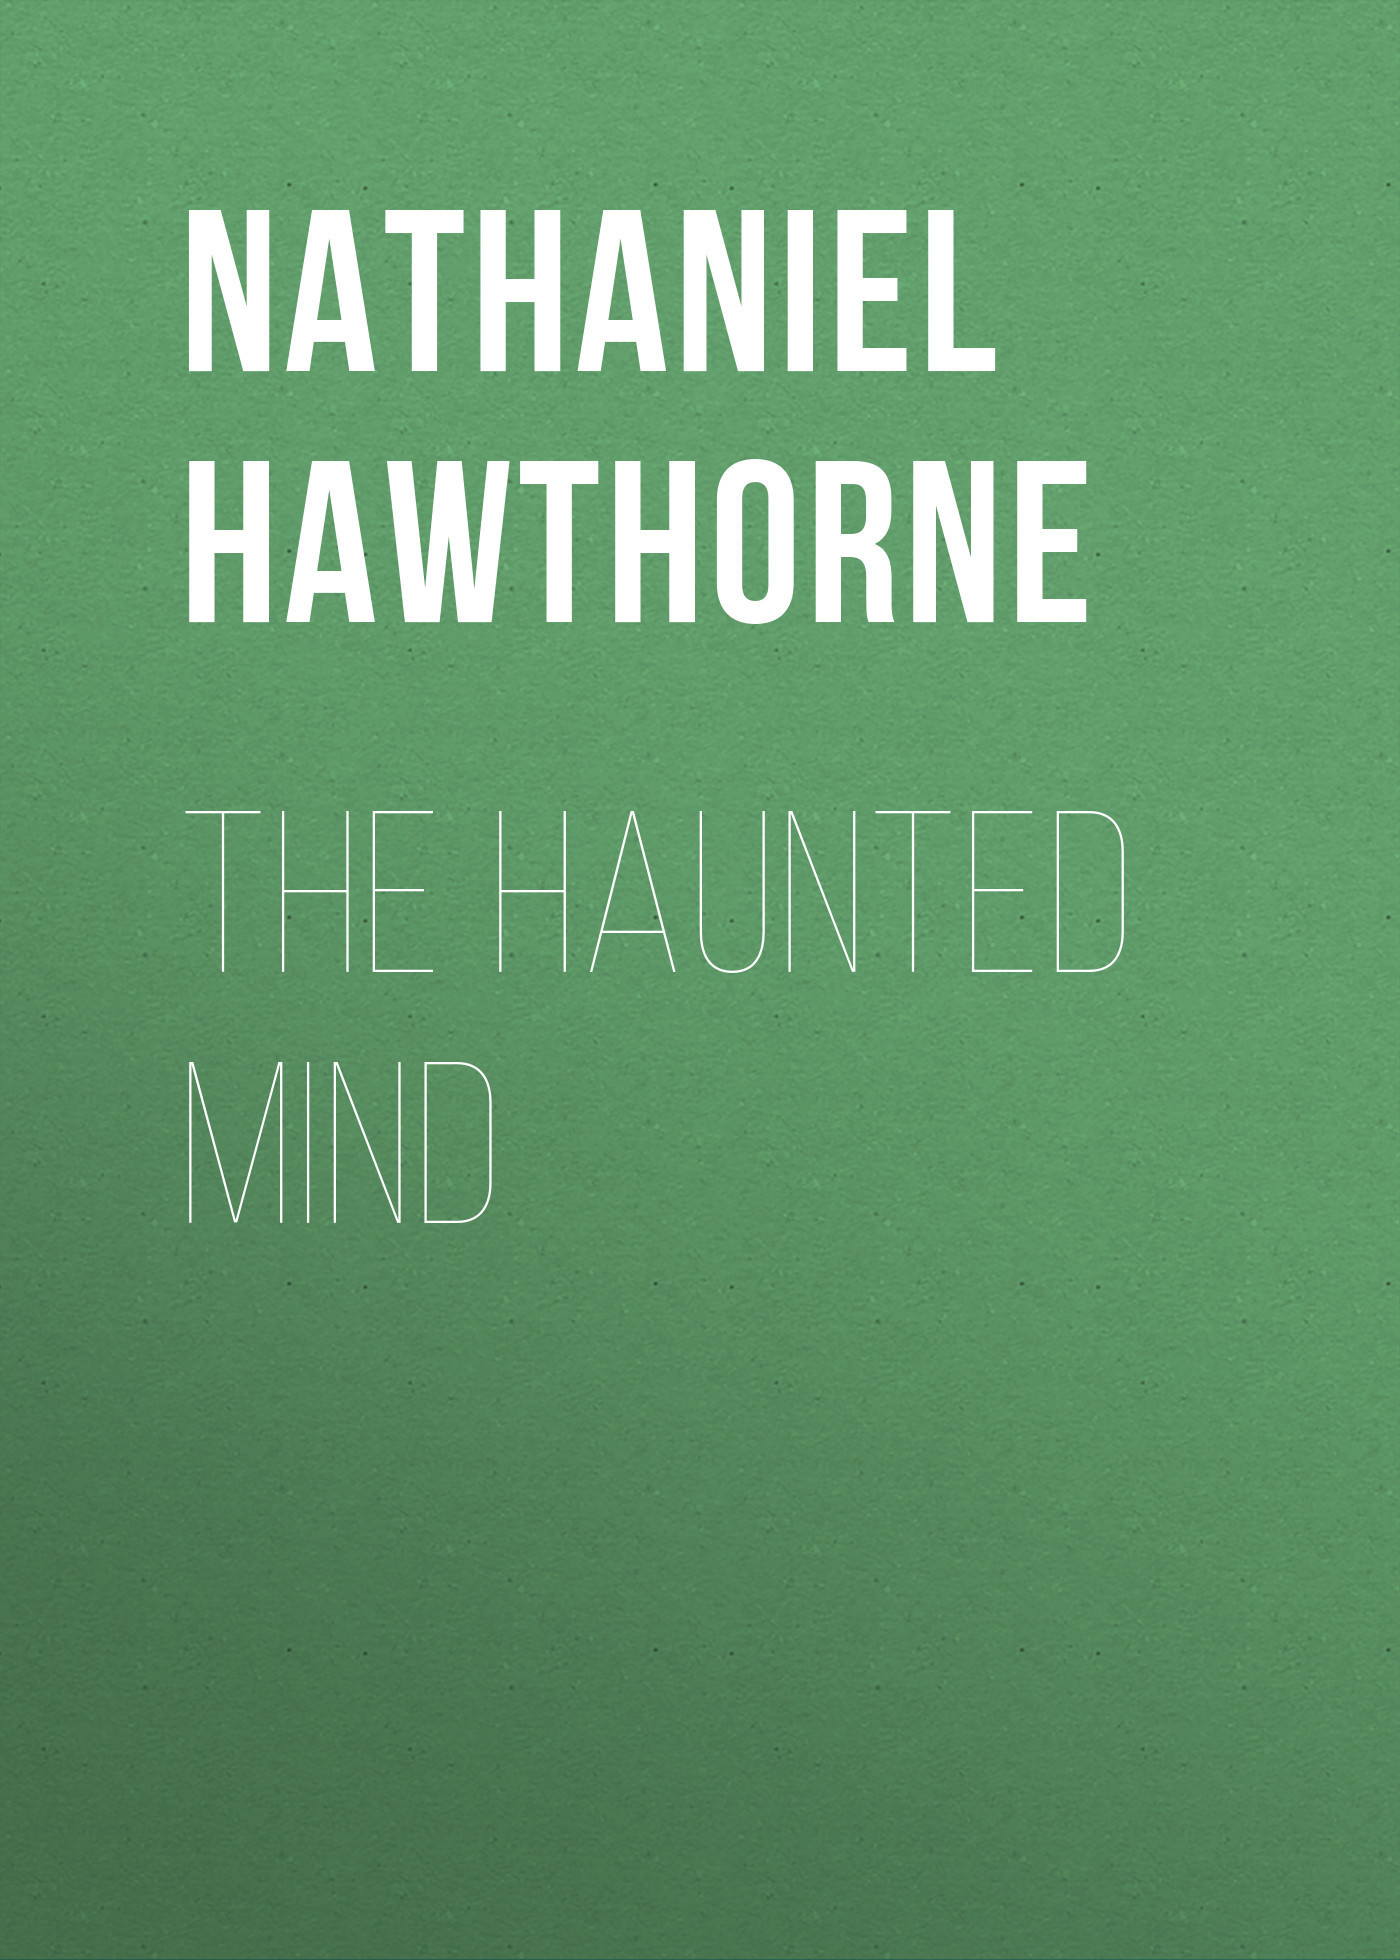 Nathaniel Hawthorne The Haunted Mind the mind club